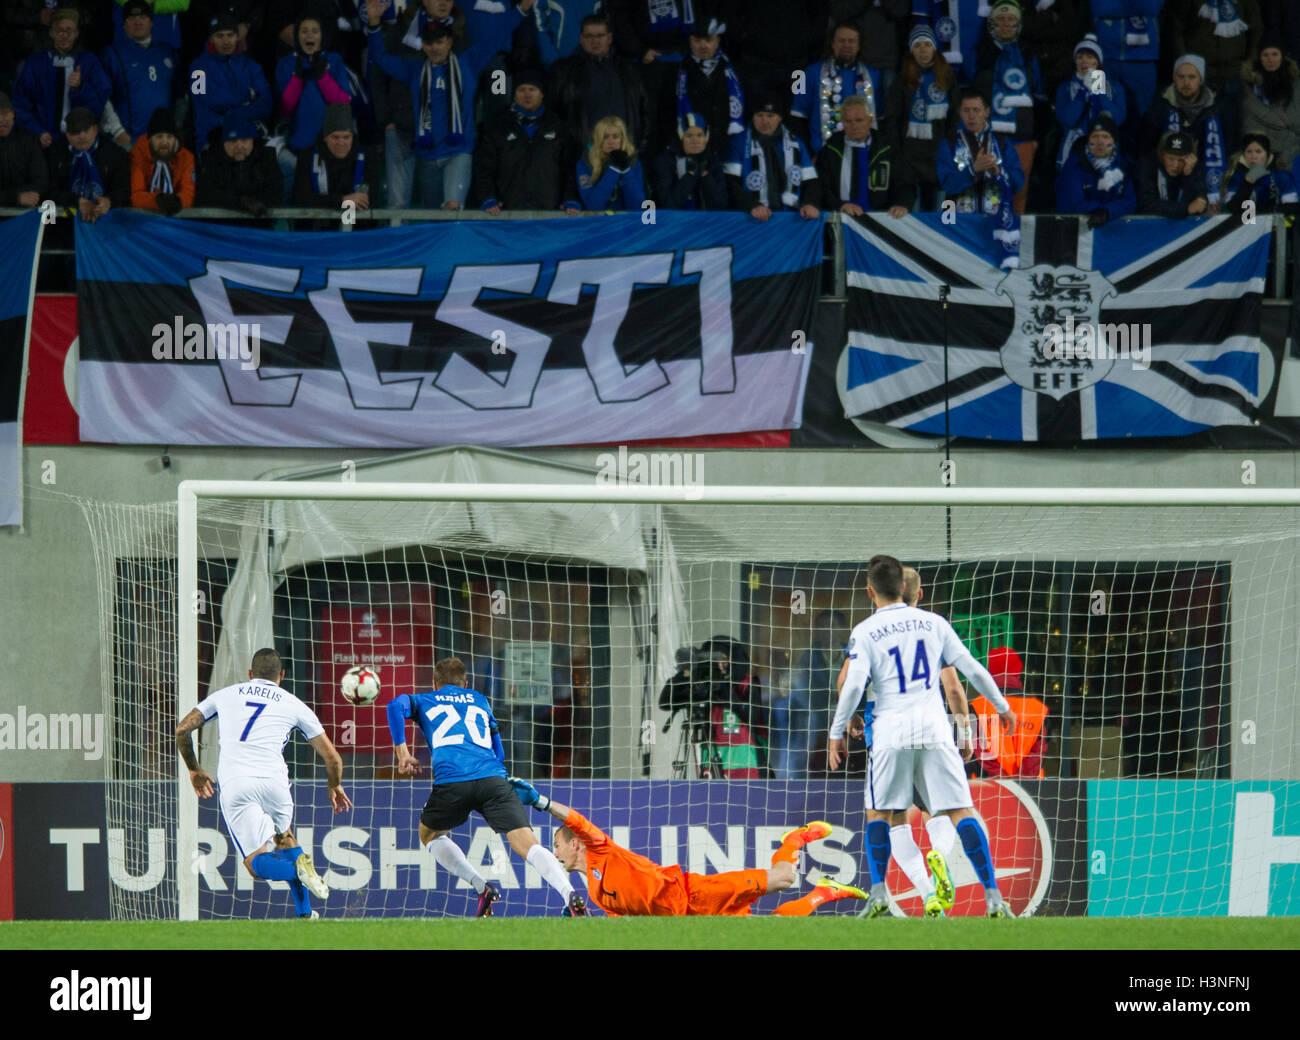 Tallinn, Estonia, 10th October 2016. Estonia's goal keeper Mihkel Aksalu (C) take the second score of the game during Stock Photo